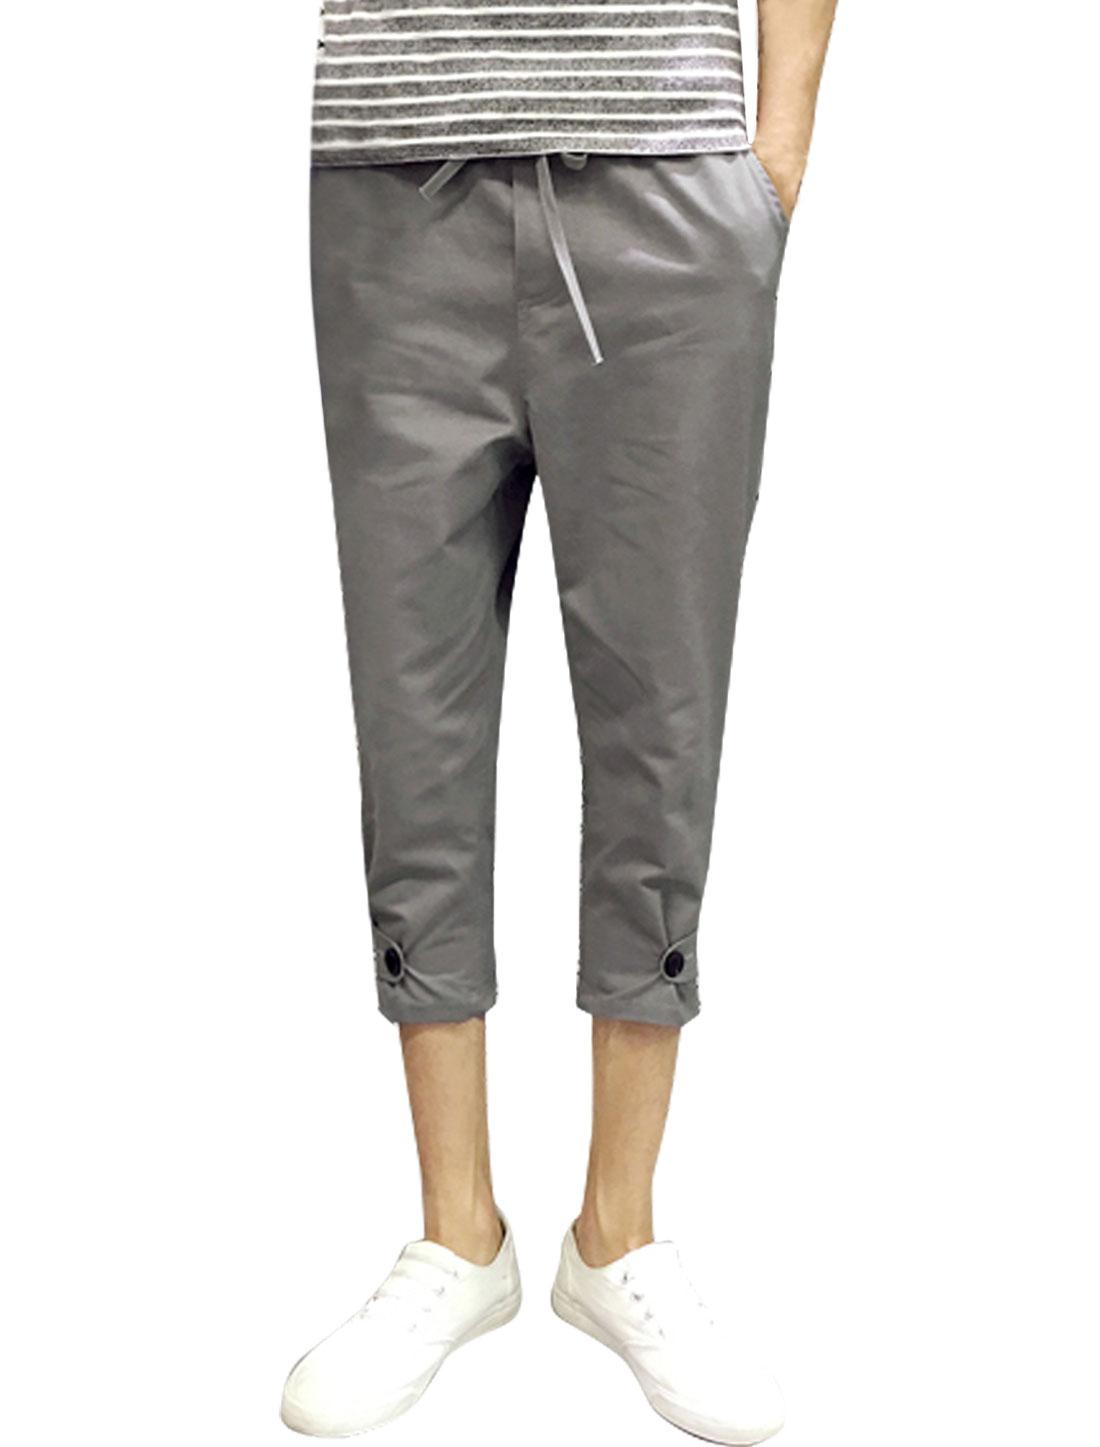 Men Drawstring Elastic Waist Pockets Capri Pants Gray W32